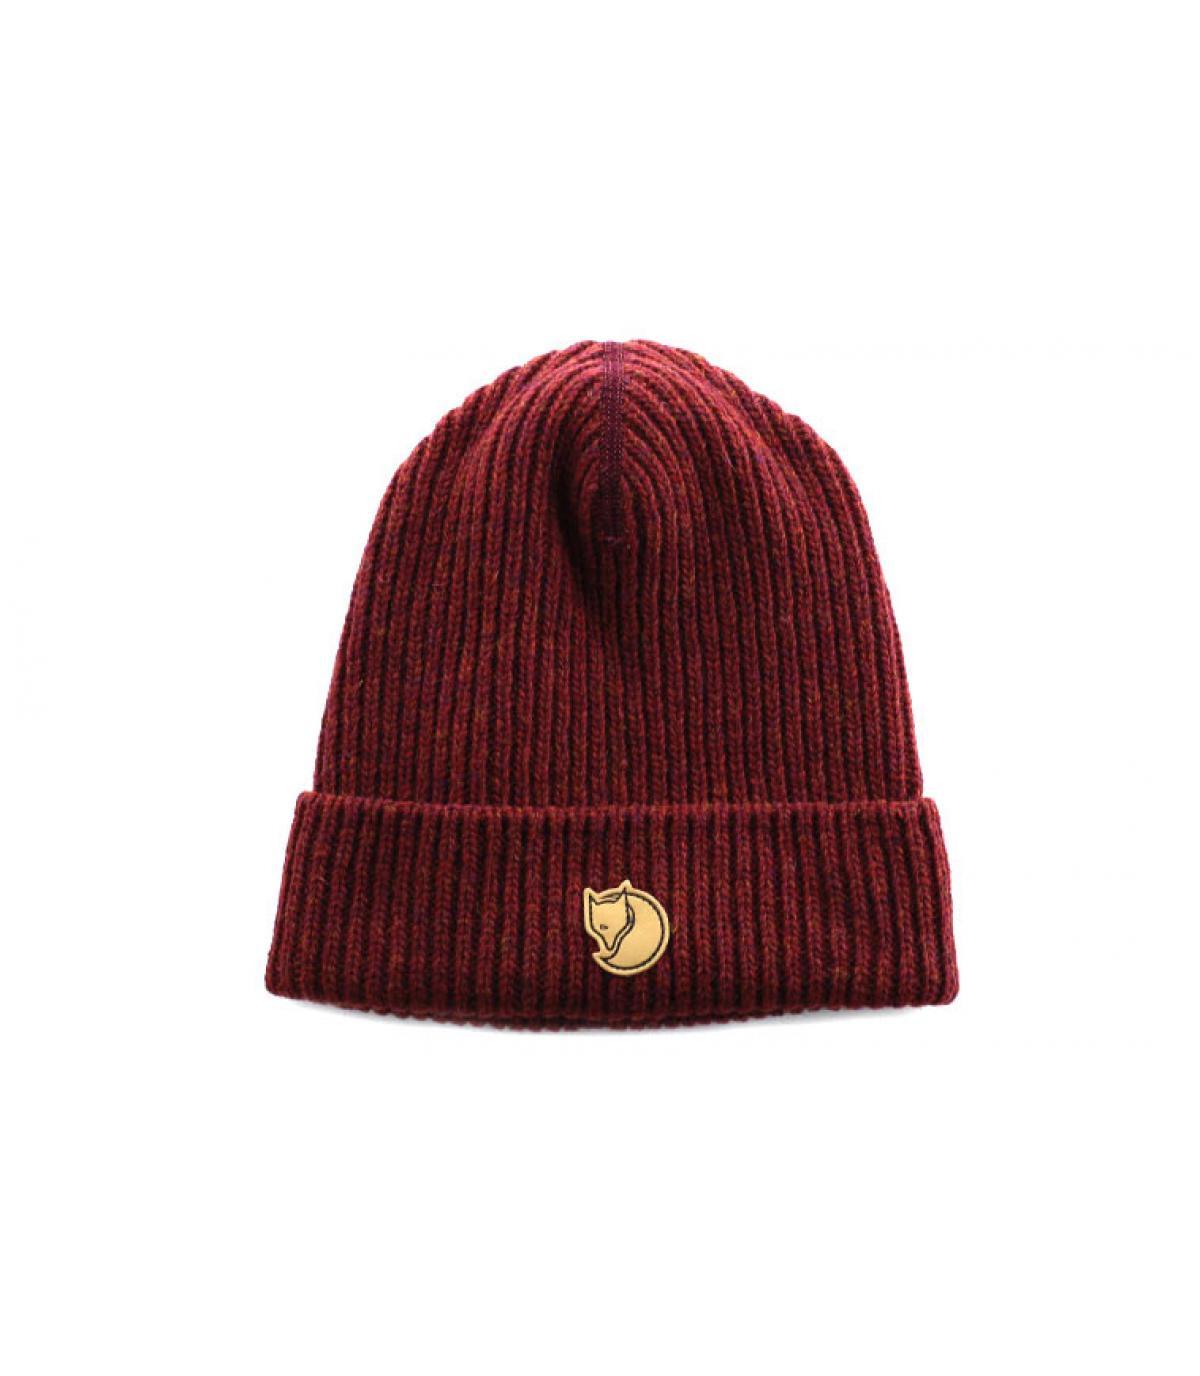 gorro solapa de lana burdeos - Rib beanie red oak Fjallraven imagen 1 ... 0b20cd478a6